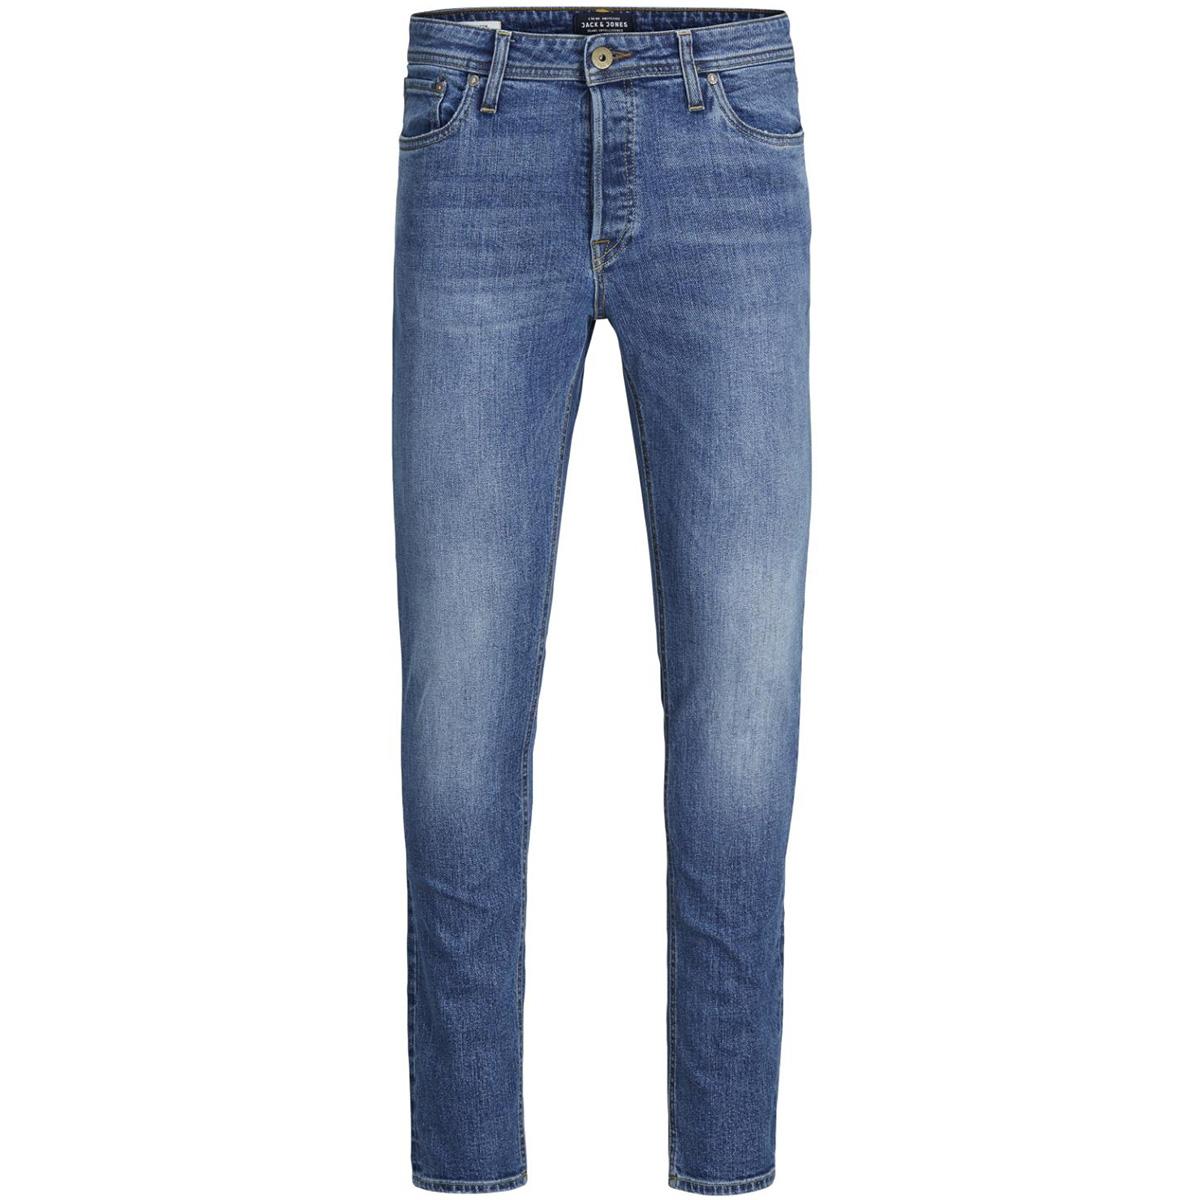 jjitim jjoriginal am 654 lid 12130516 jack & jones jeans blue denim